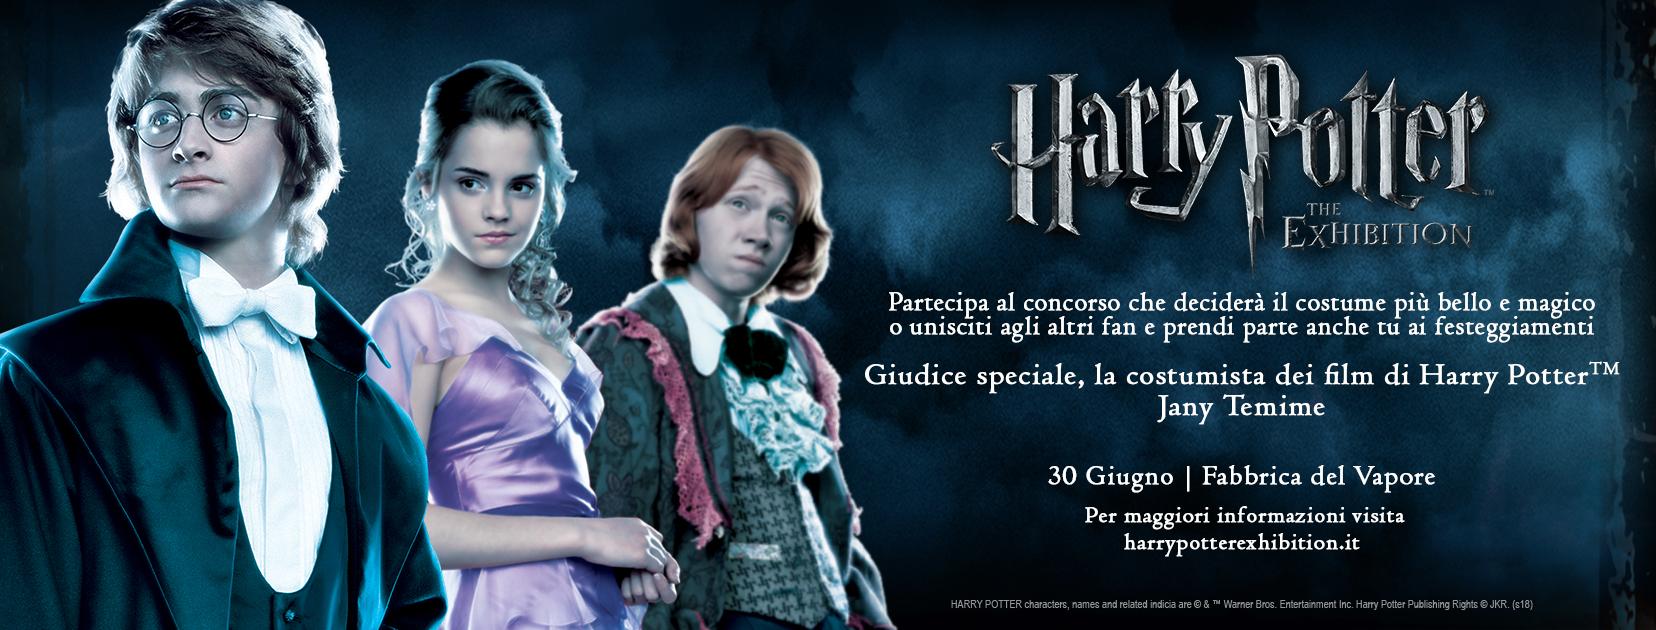 Harry Potter - Exhibition Contest